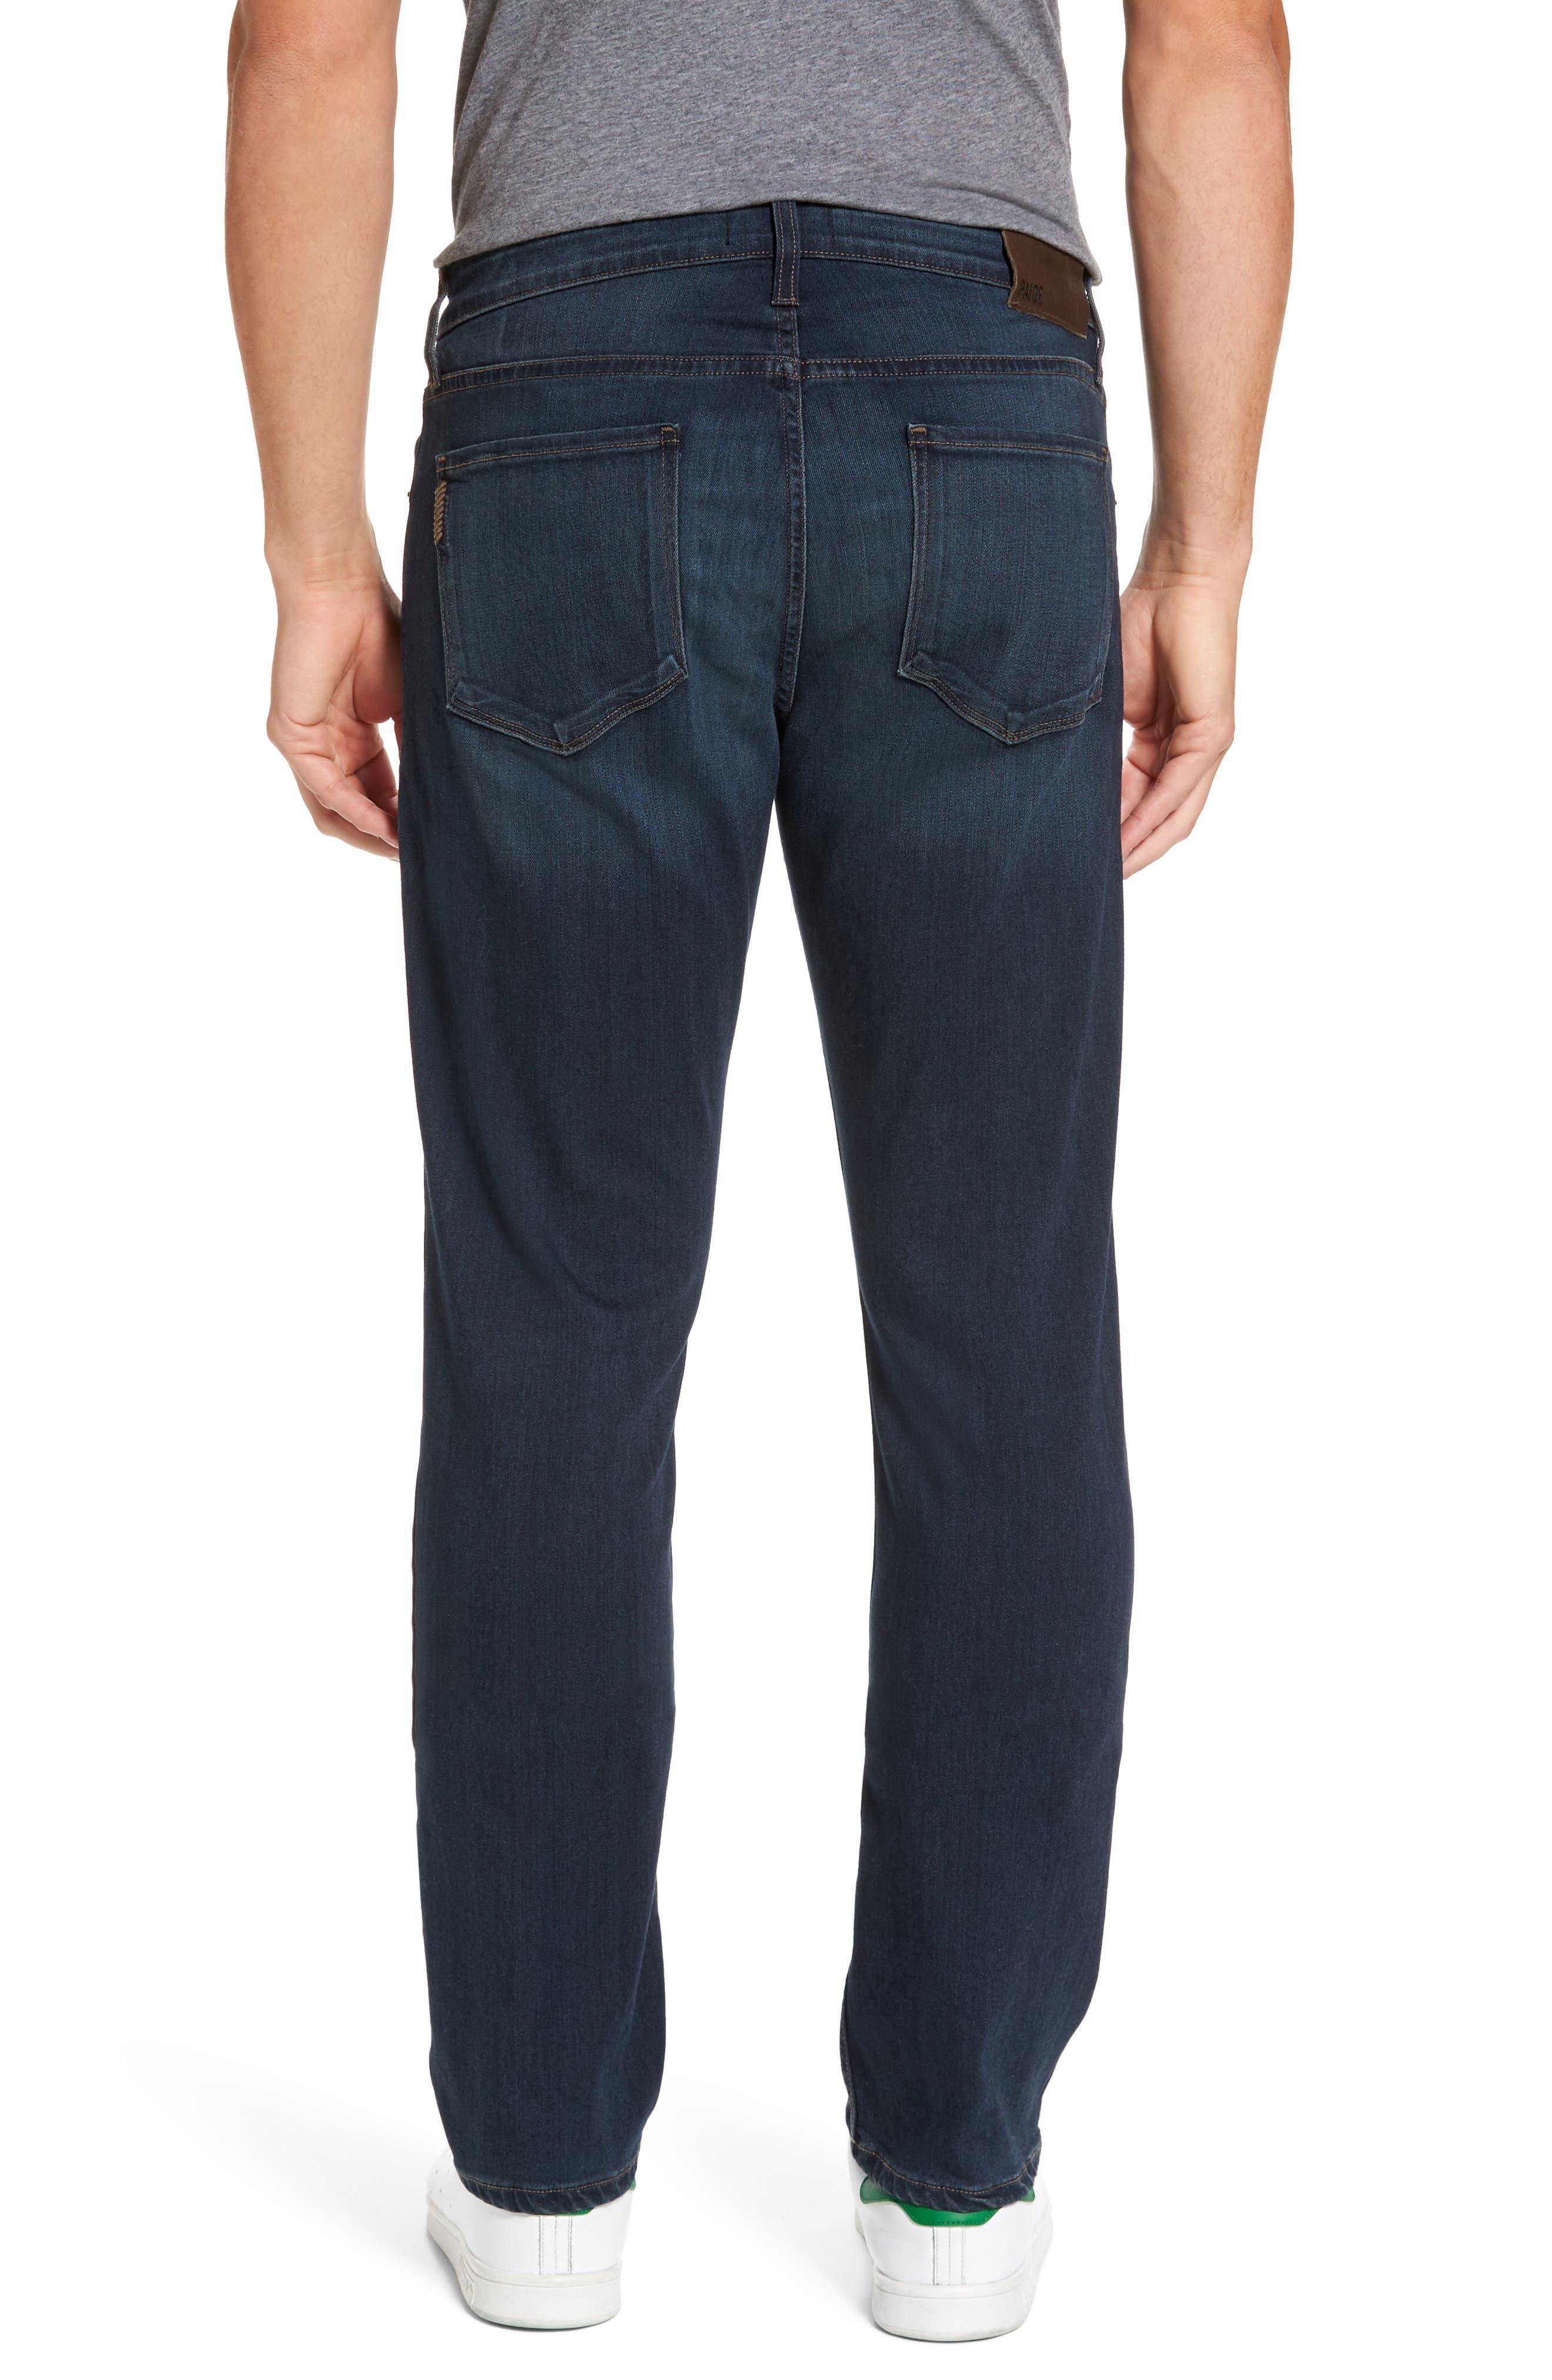 Normandie Straight Fit Jeans,                             Alternate thumbnail 2, color,                             400